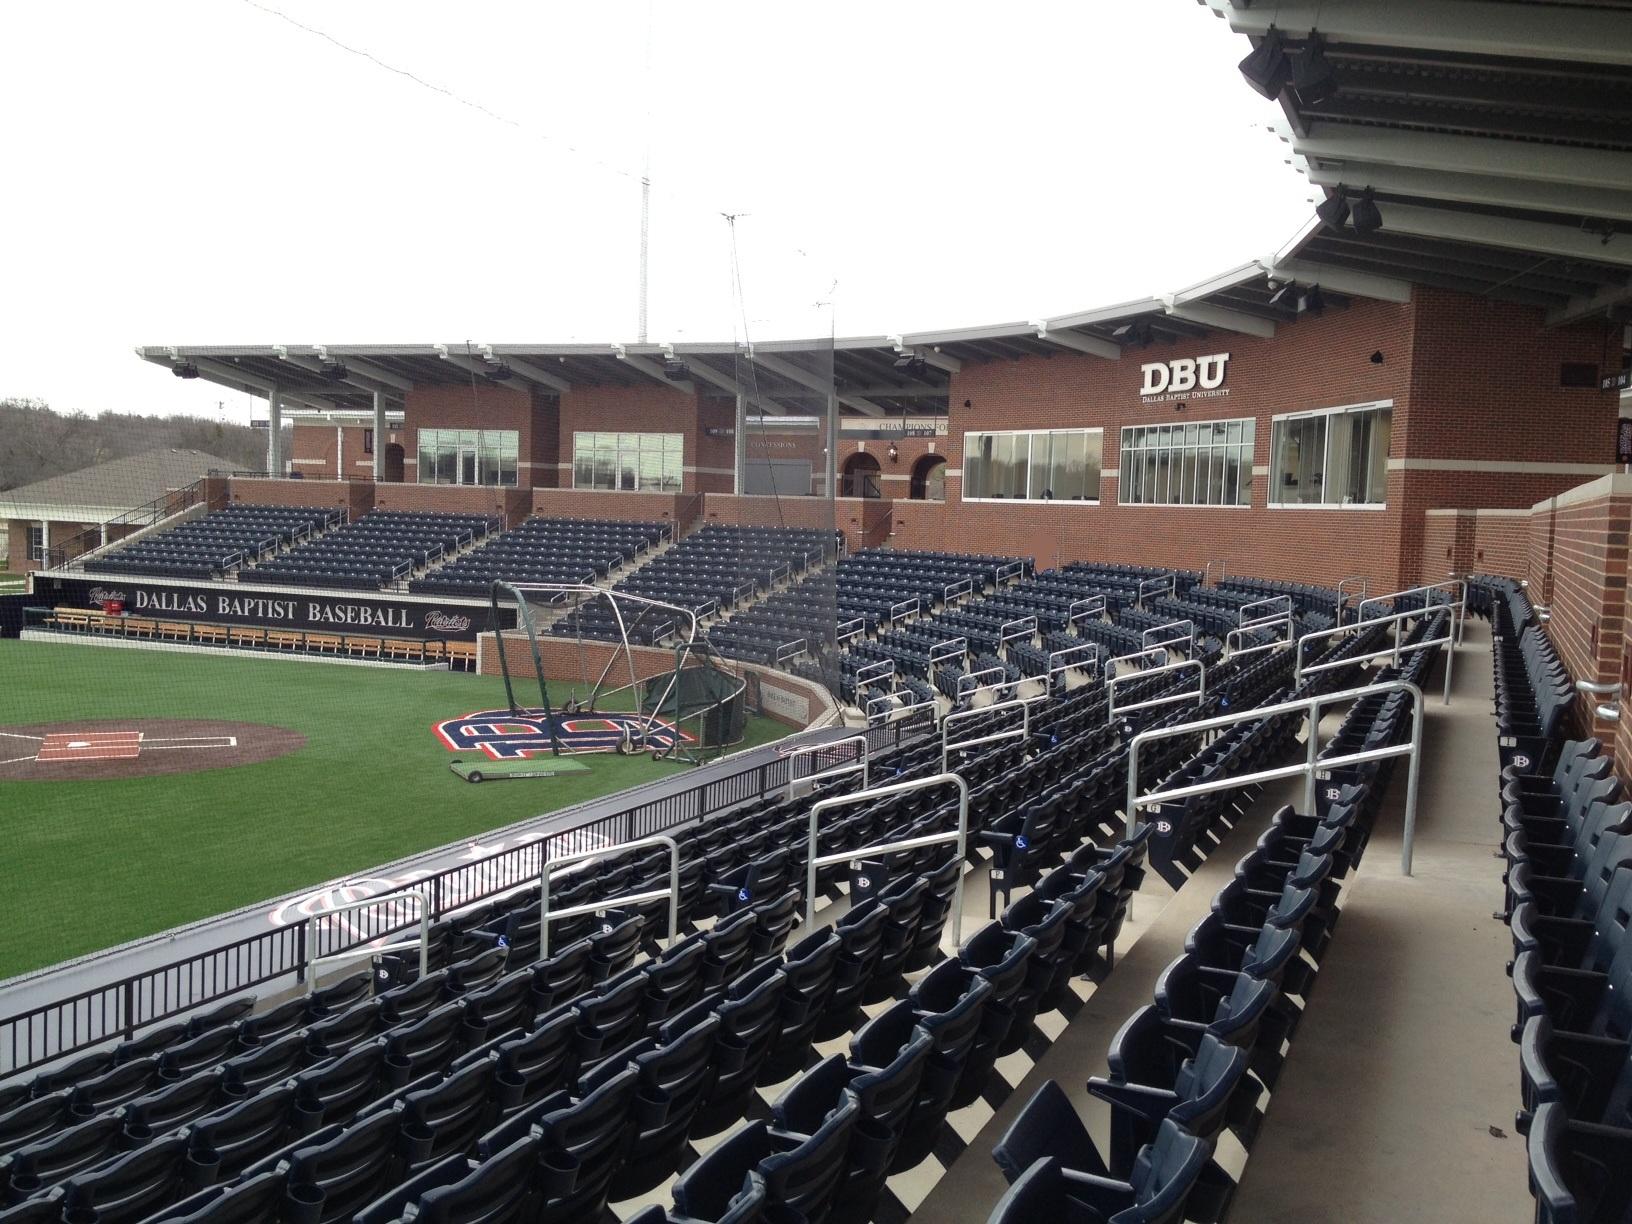 File:Joan and Andy Horner Ballpark, Dallas Baptist ...: http://commons.wikimedia.org/wiki/file:joan_and_andy_horner_ballpark,_dallas_baptist_university.jpg